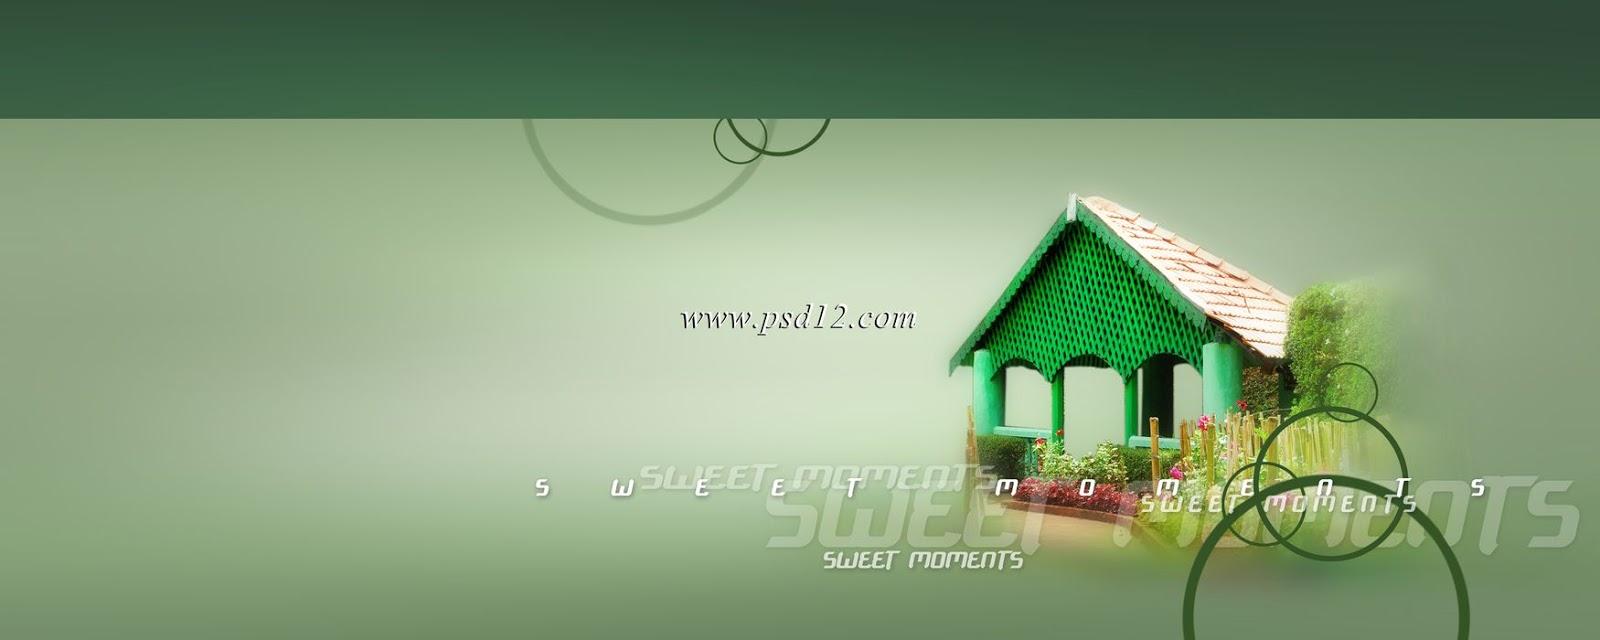 Photoshop Backgrounds: 12x30 PSD Karizma Album Backgrounds